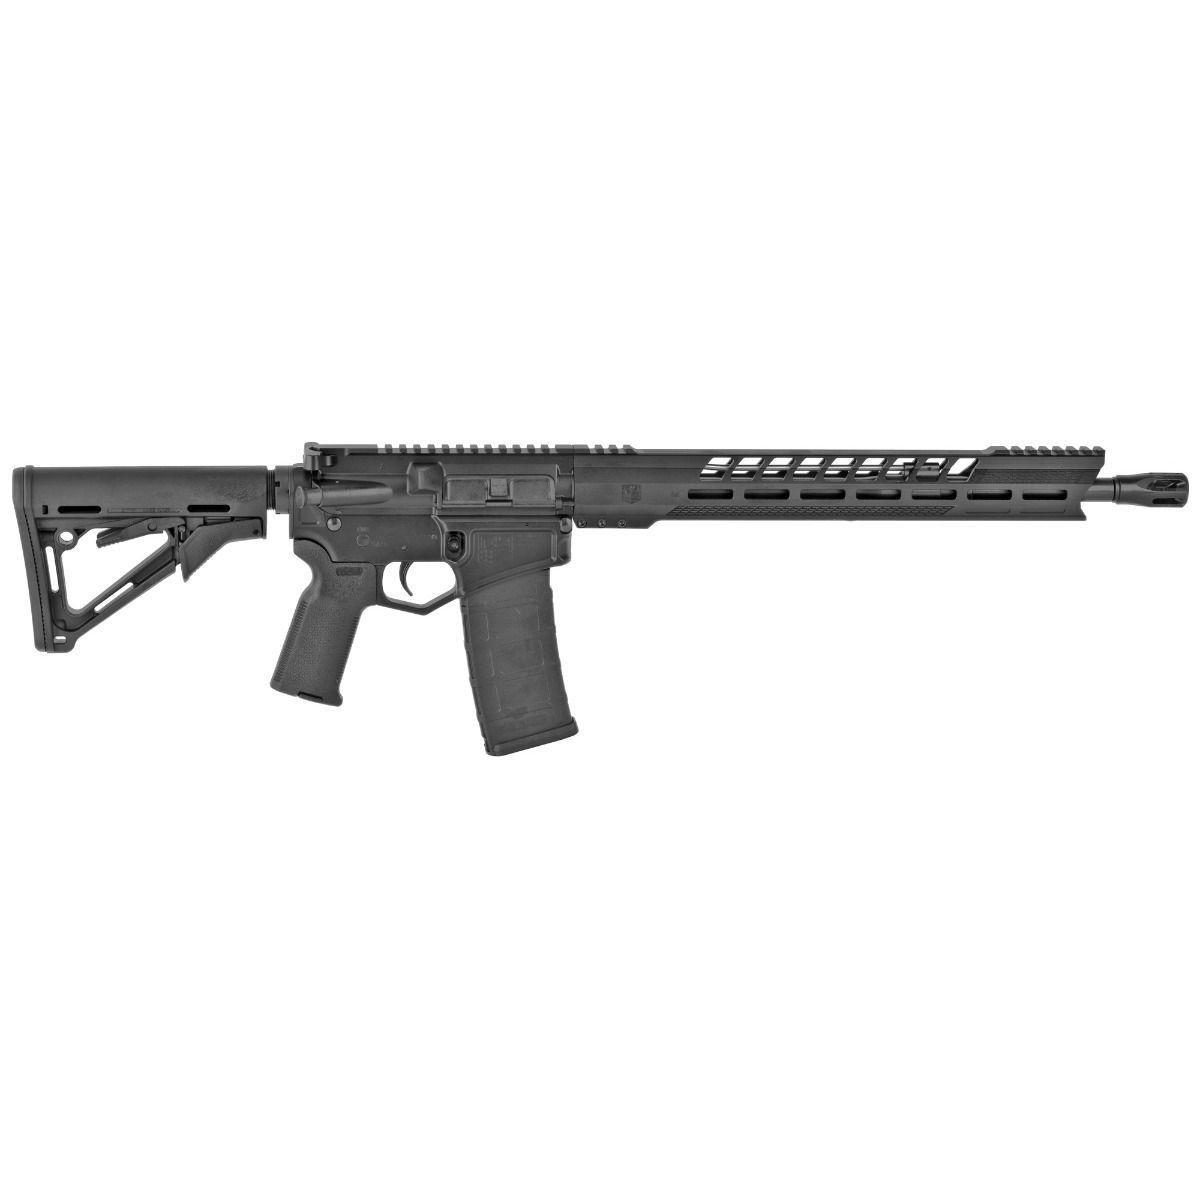 Diamondback DB15 5.56x45mm NATO 810035751095